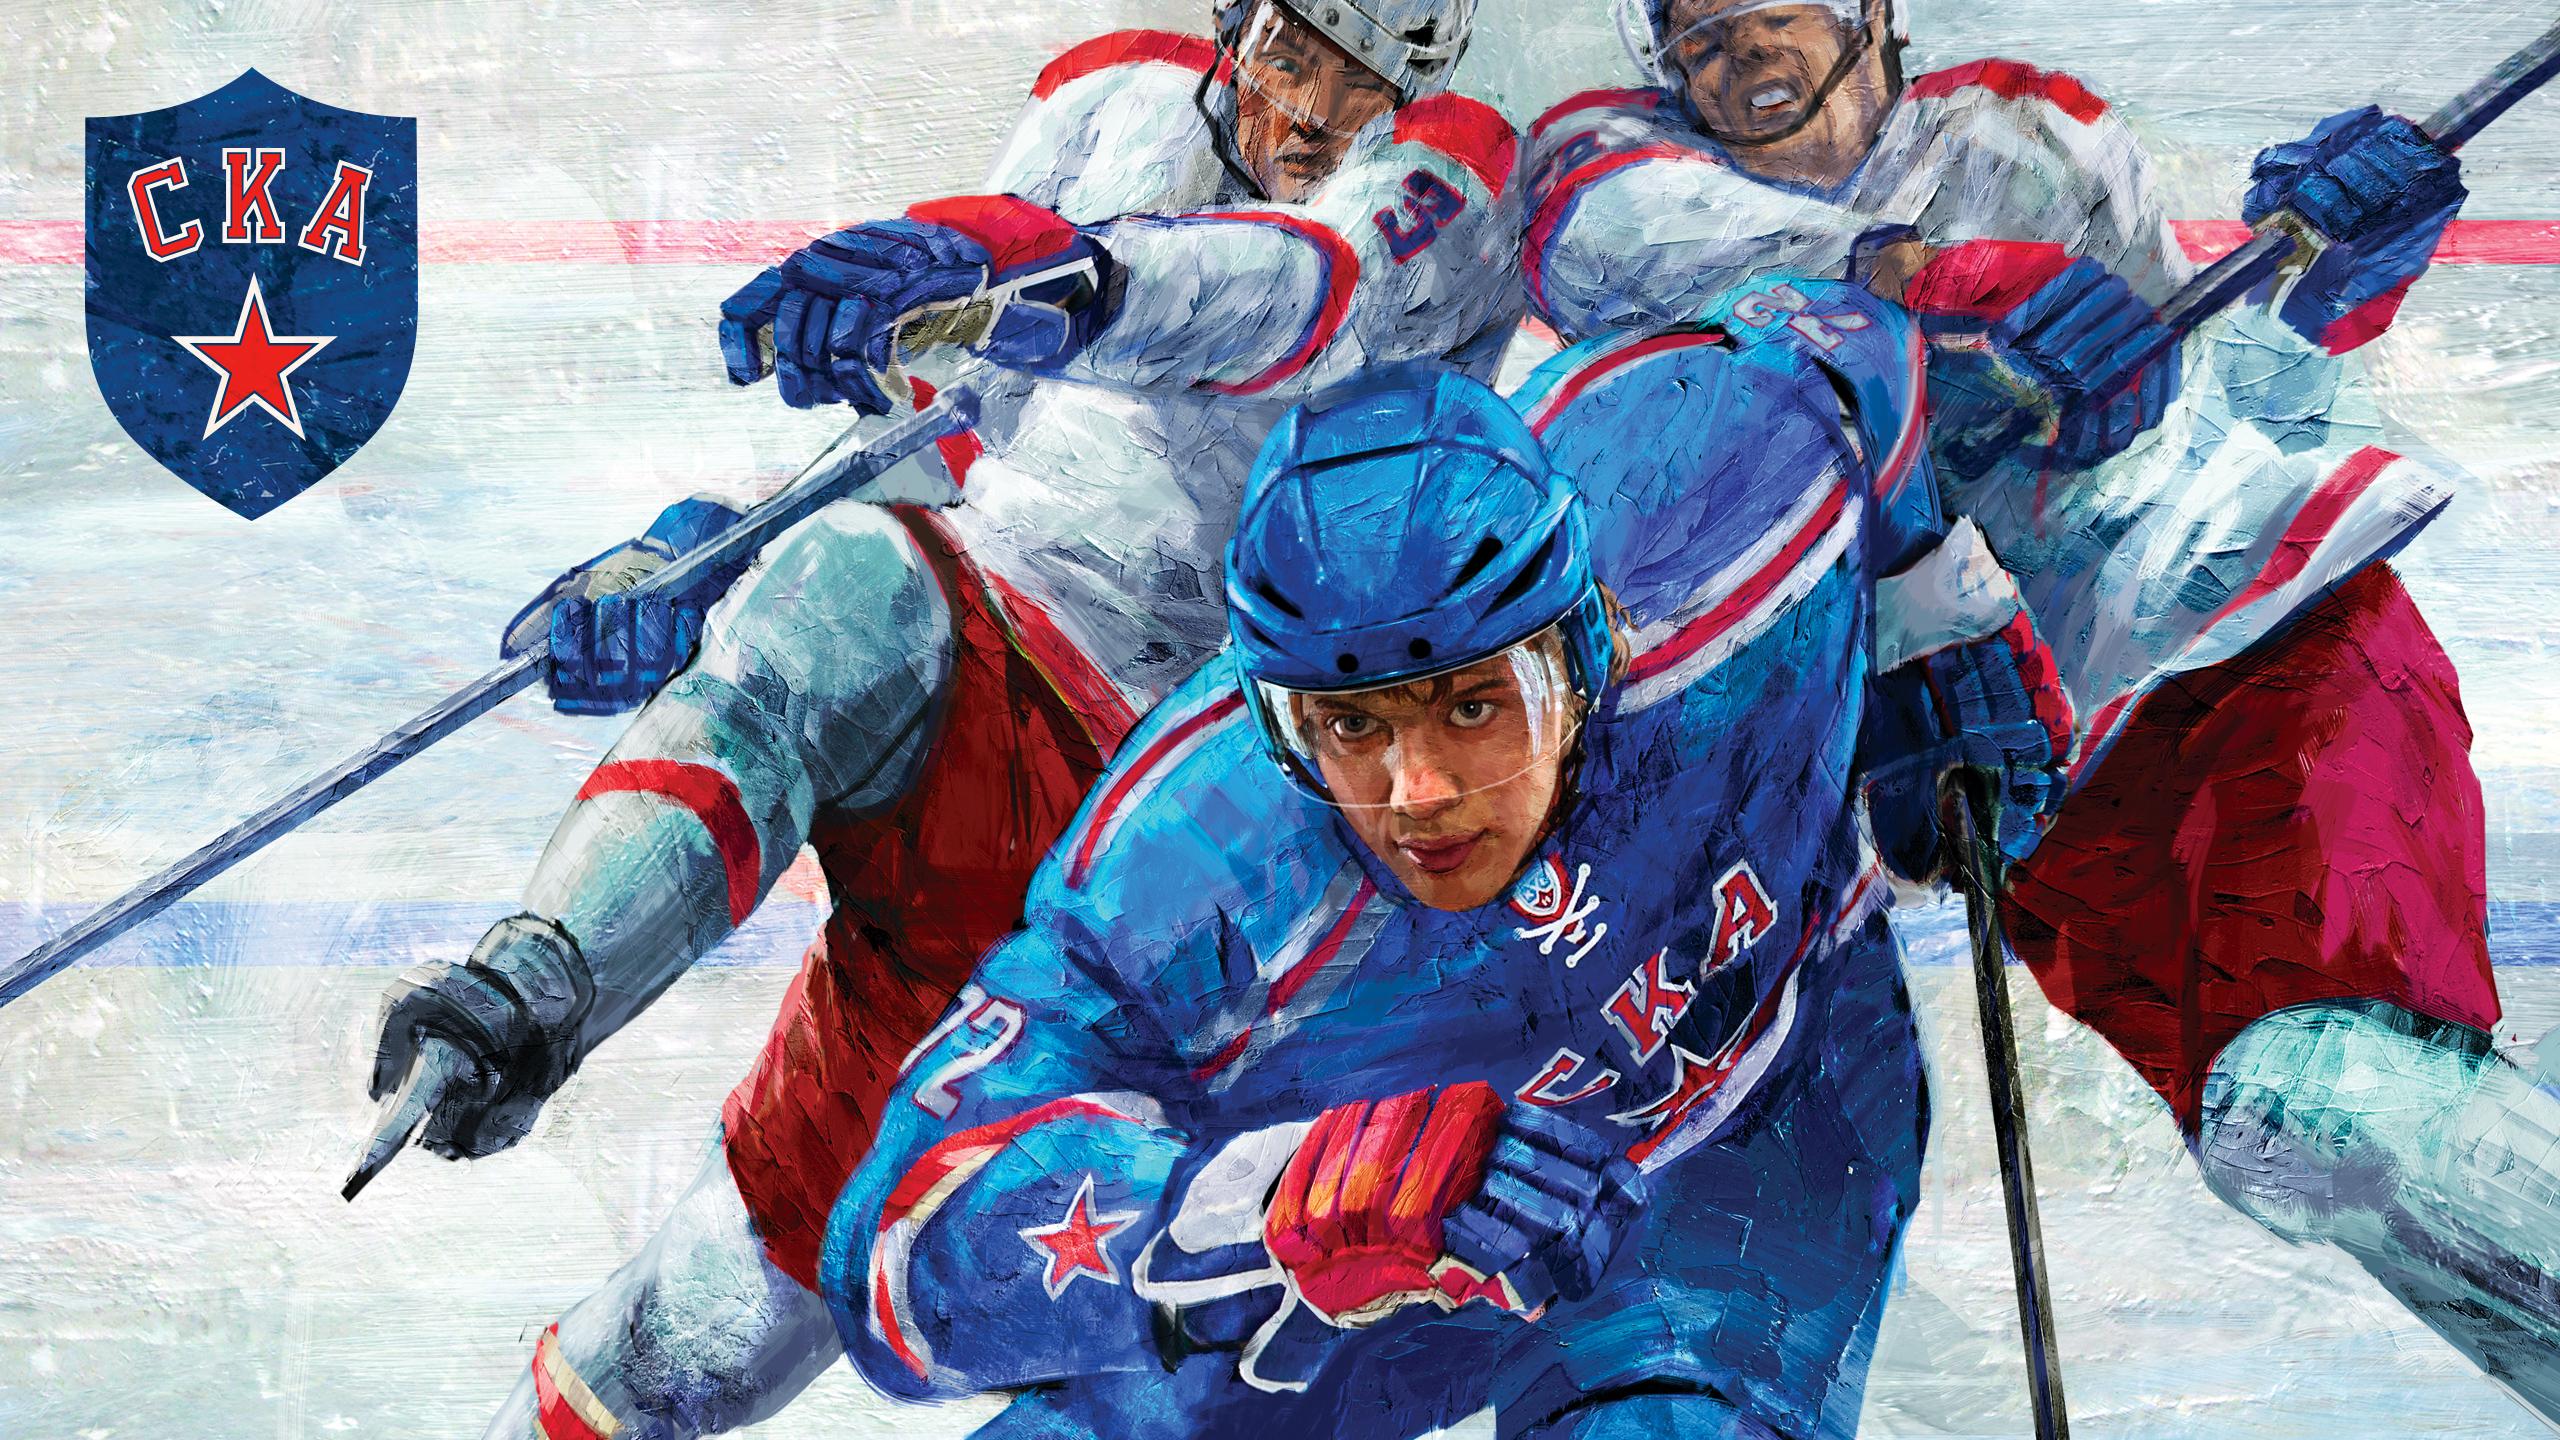 хоккей ска металлург смотреть онлайн